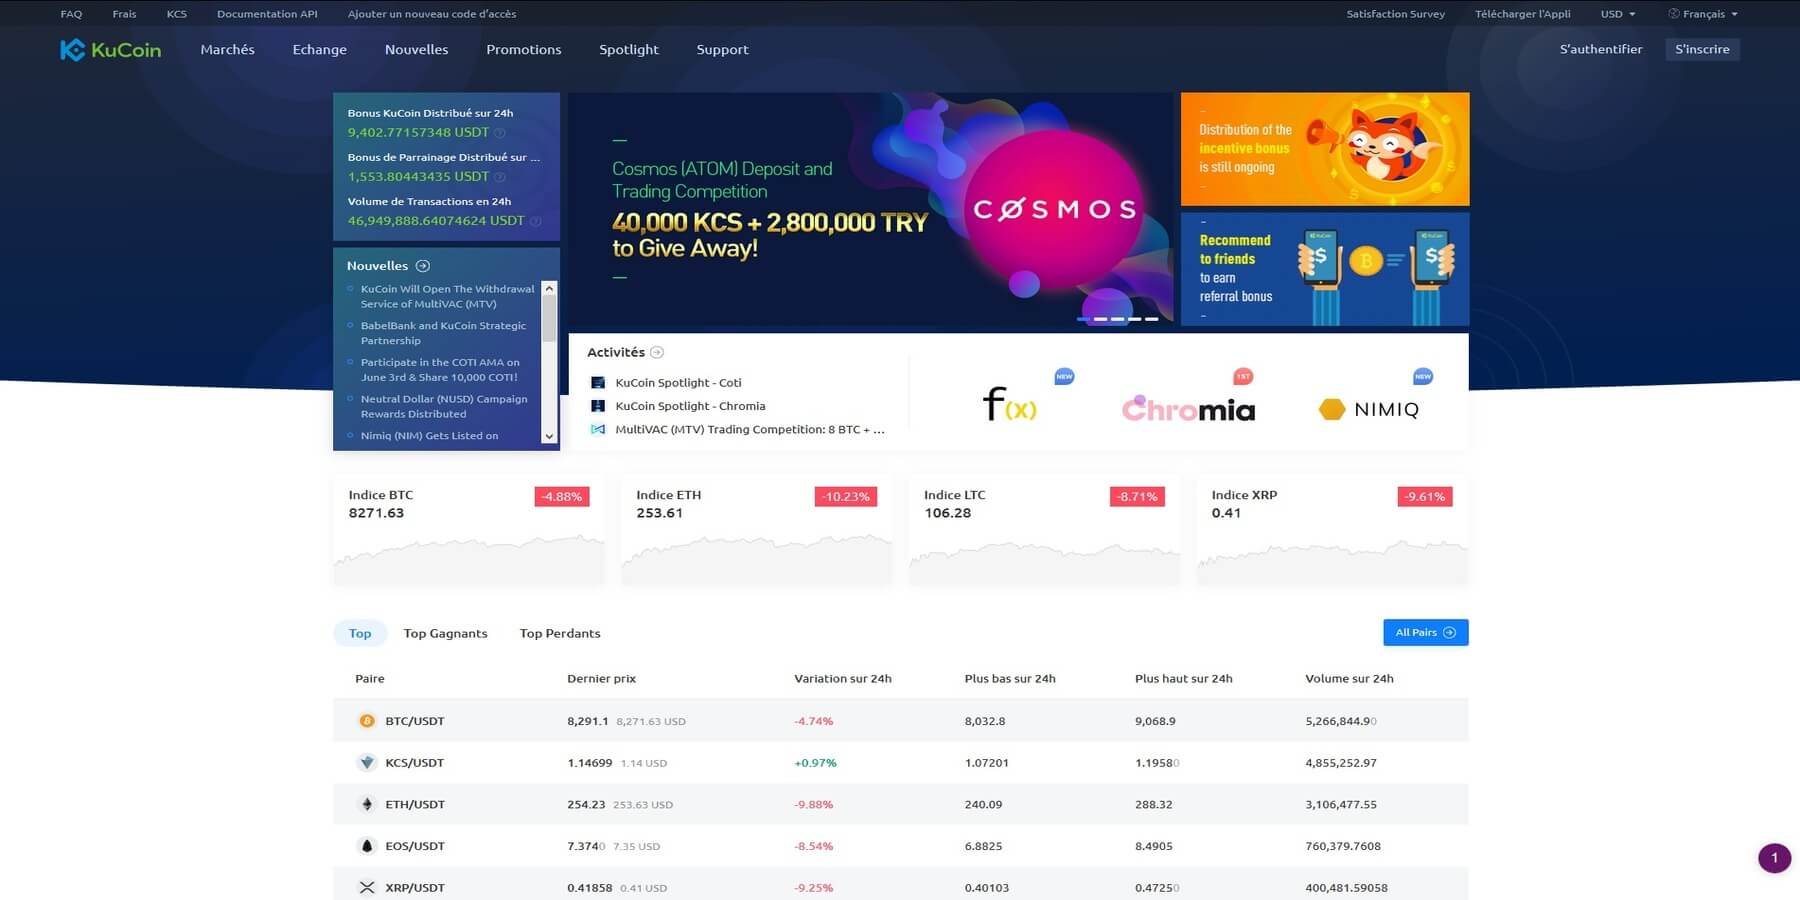 Acheter des cryptomonnaies chez KuCoin